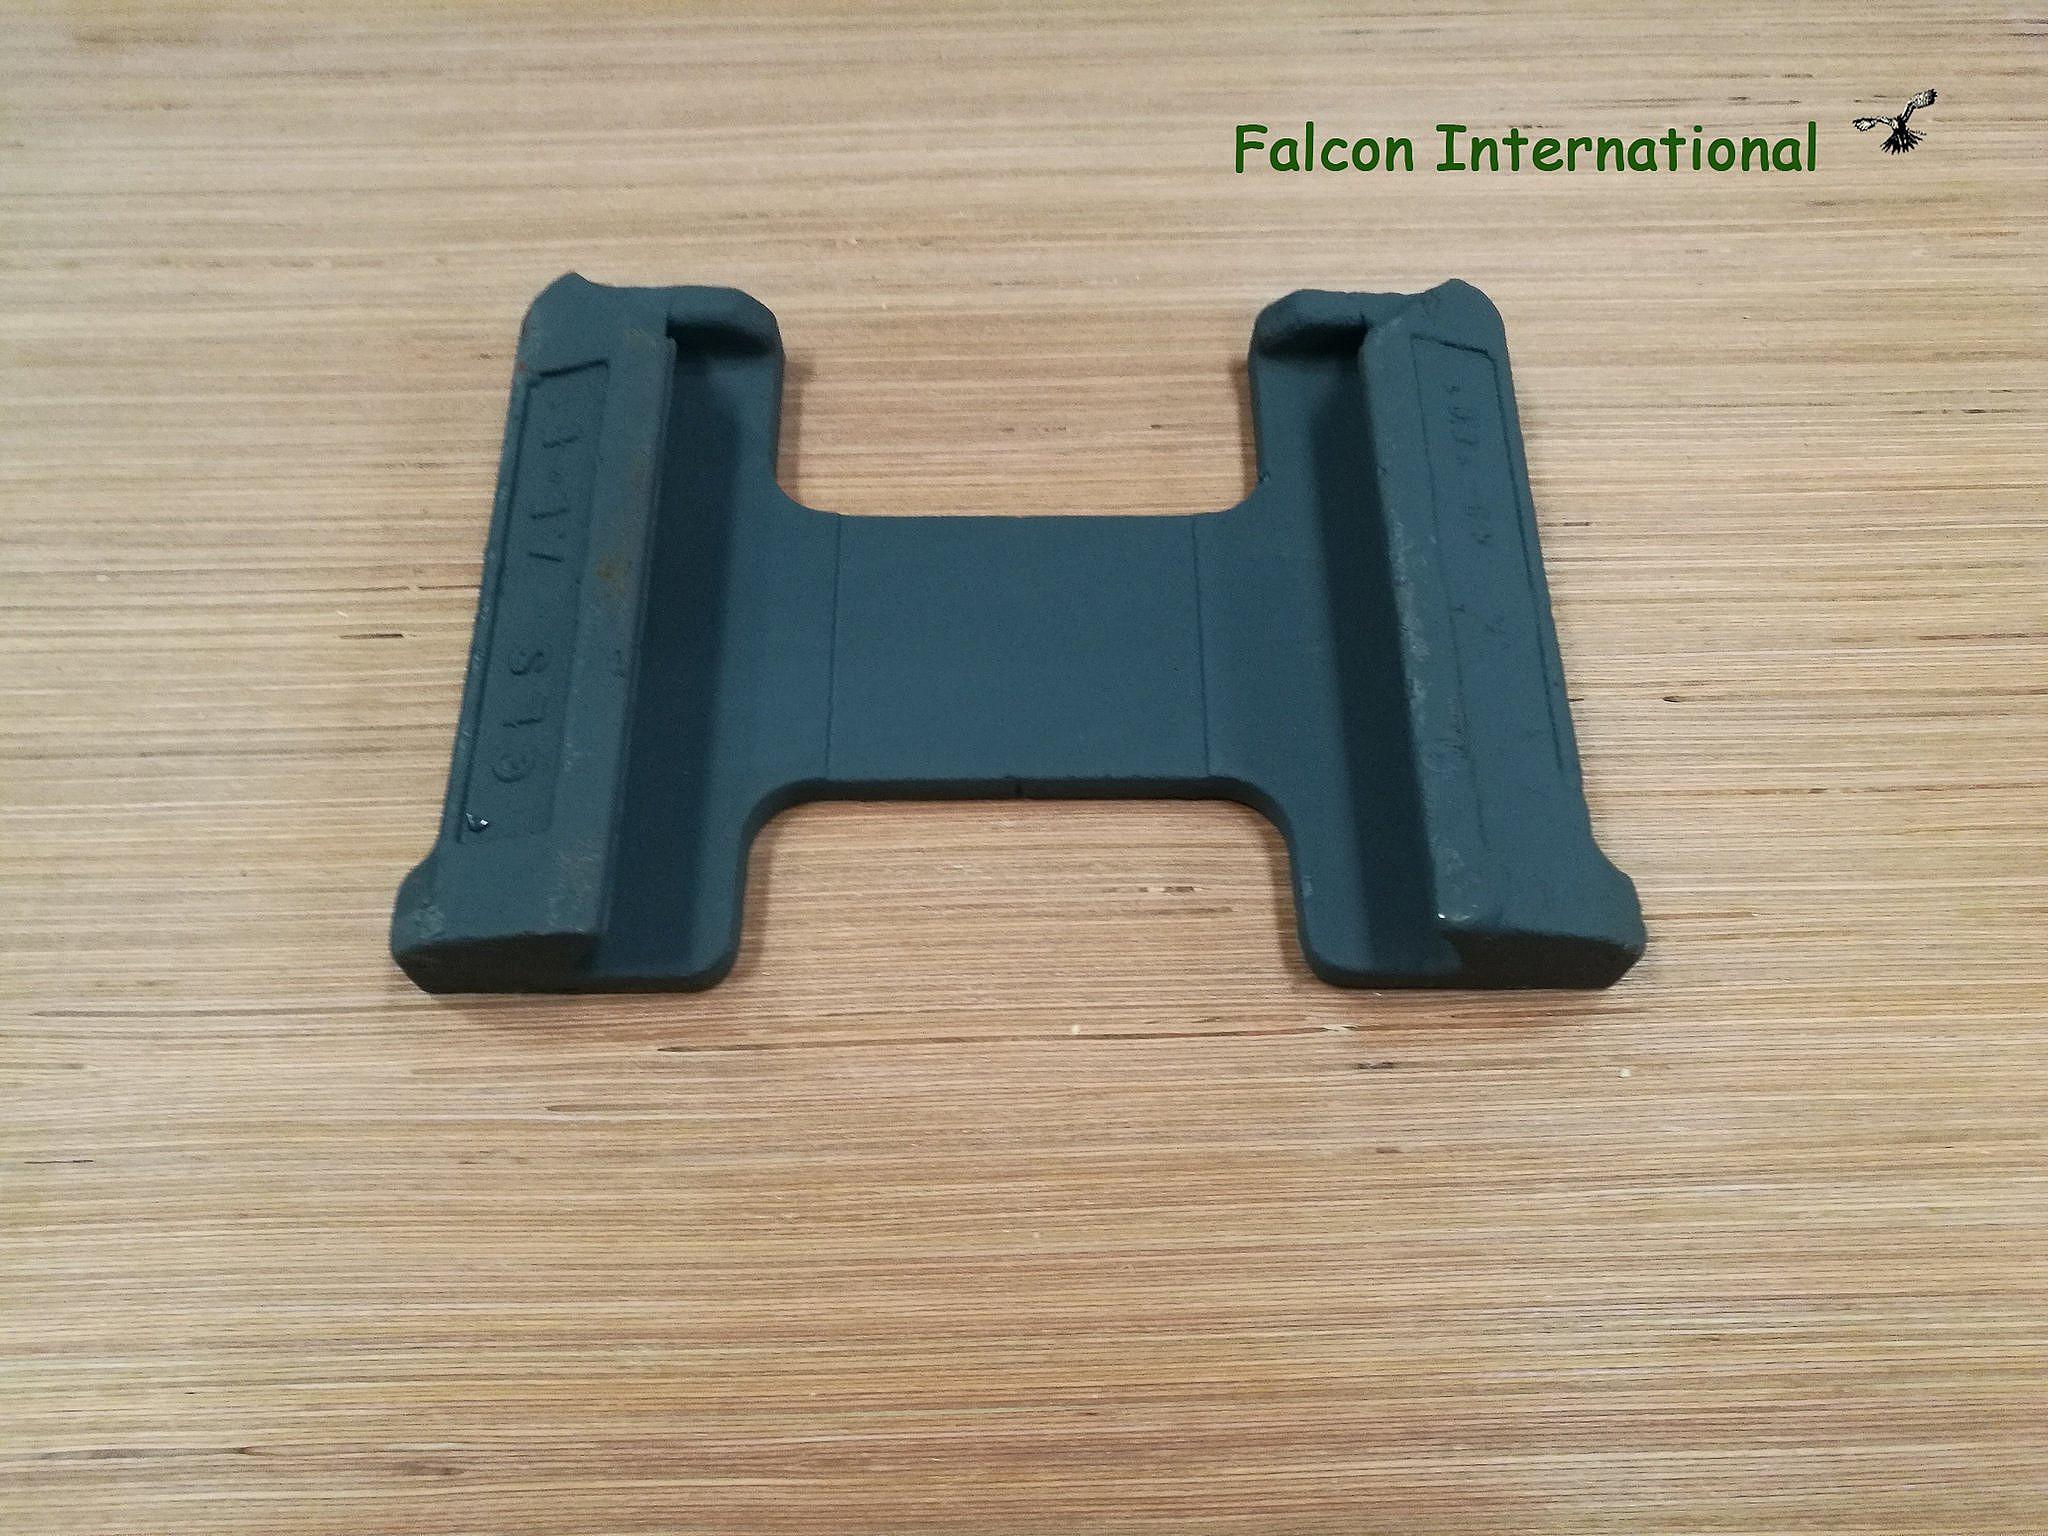 Foundation-for-Bottom-Twistlock-55-degr_1024x1024@2x